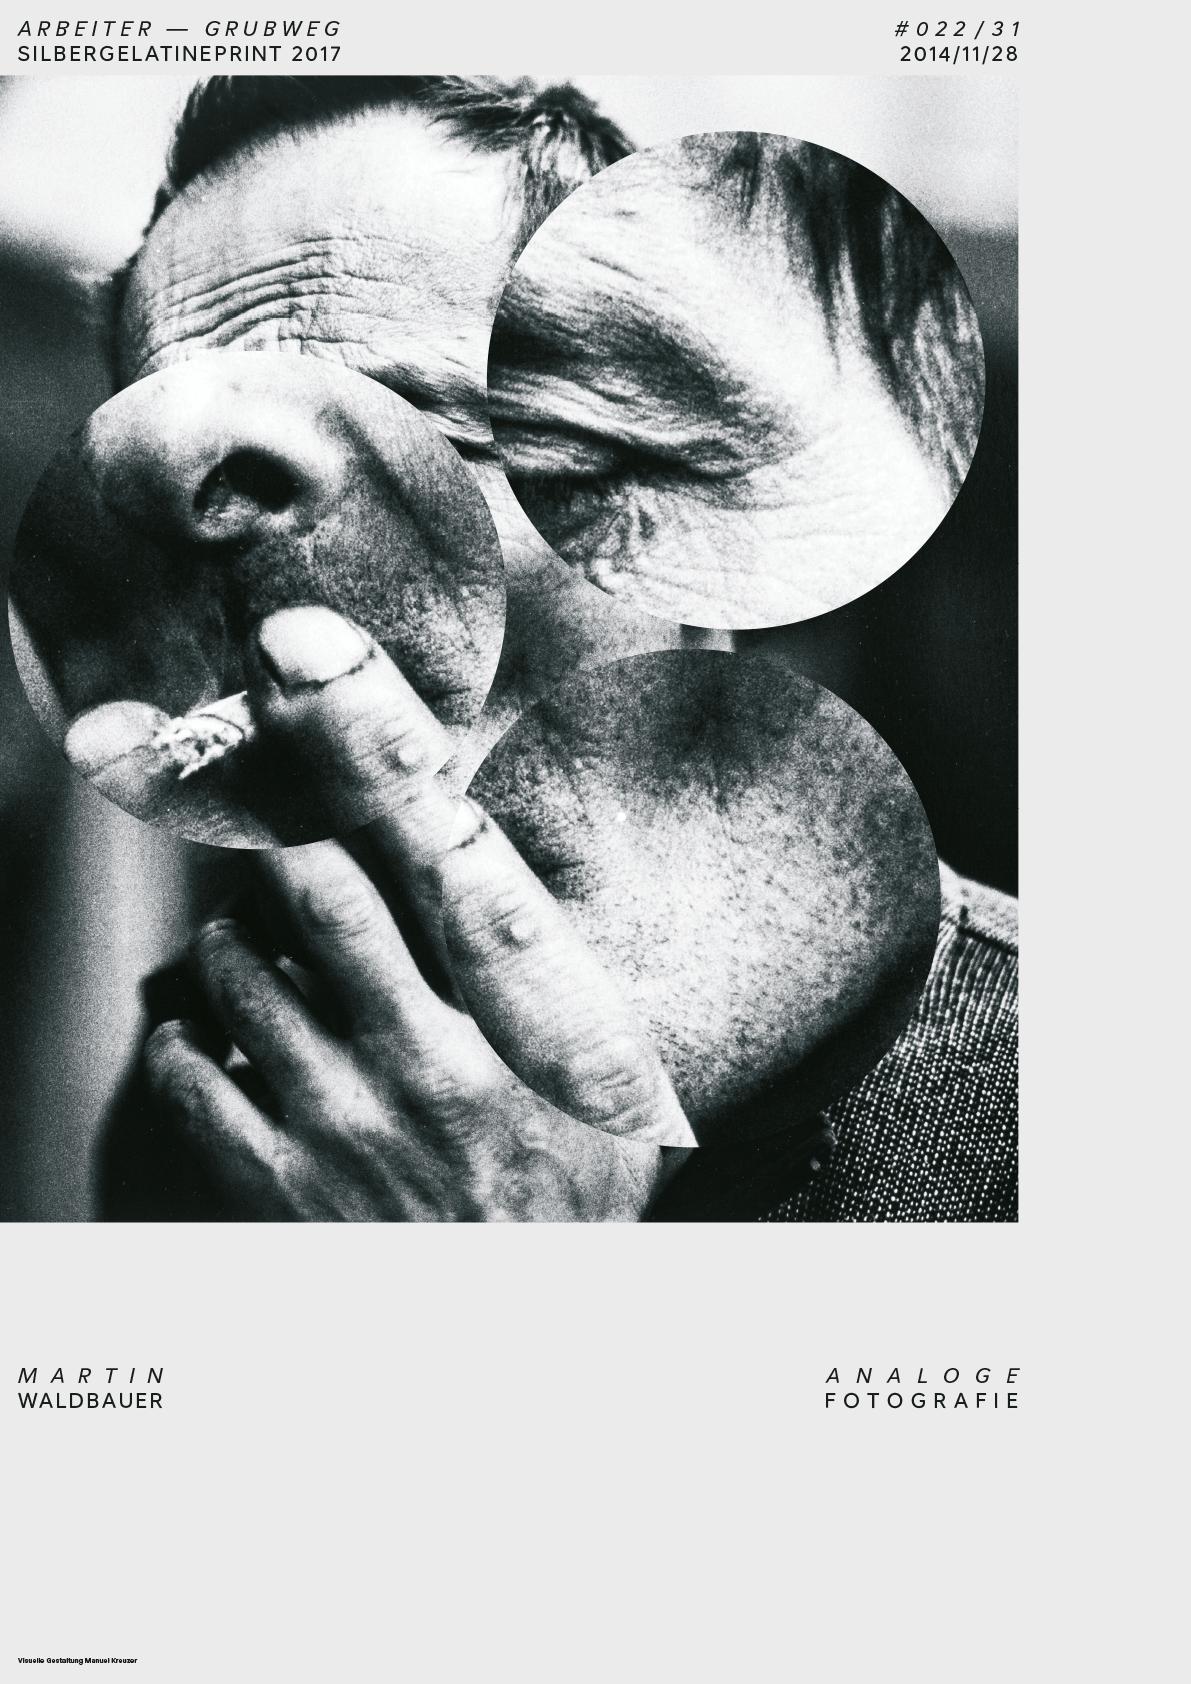 Plakatserie »Arbeiter«: Typografie trifft Fotografie